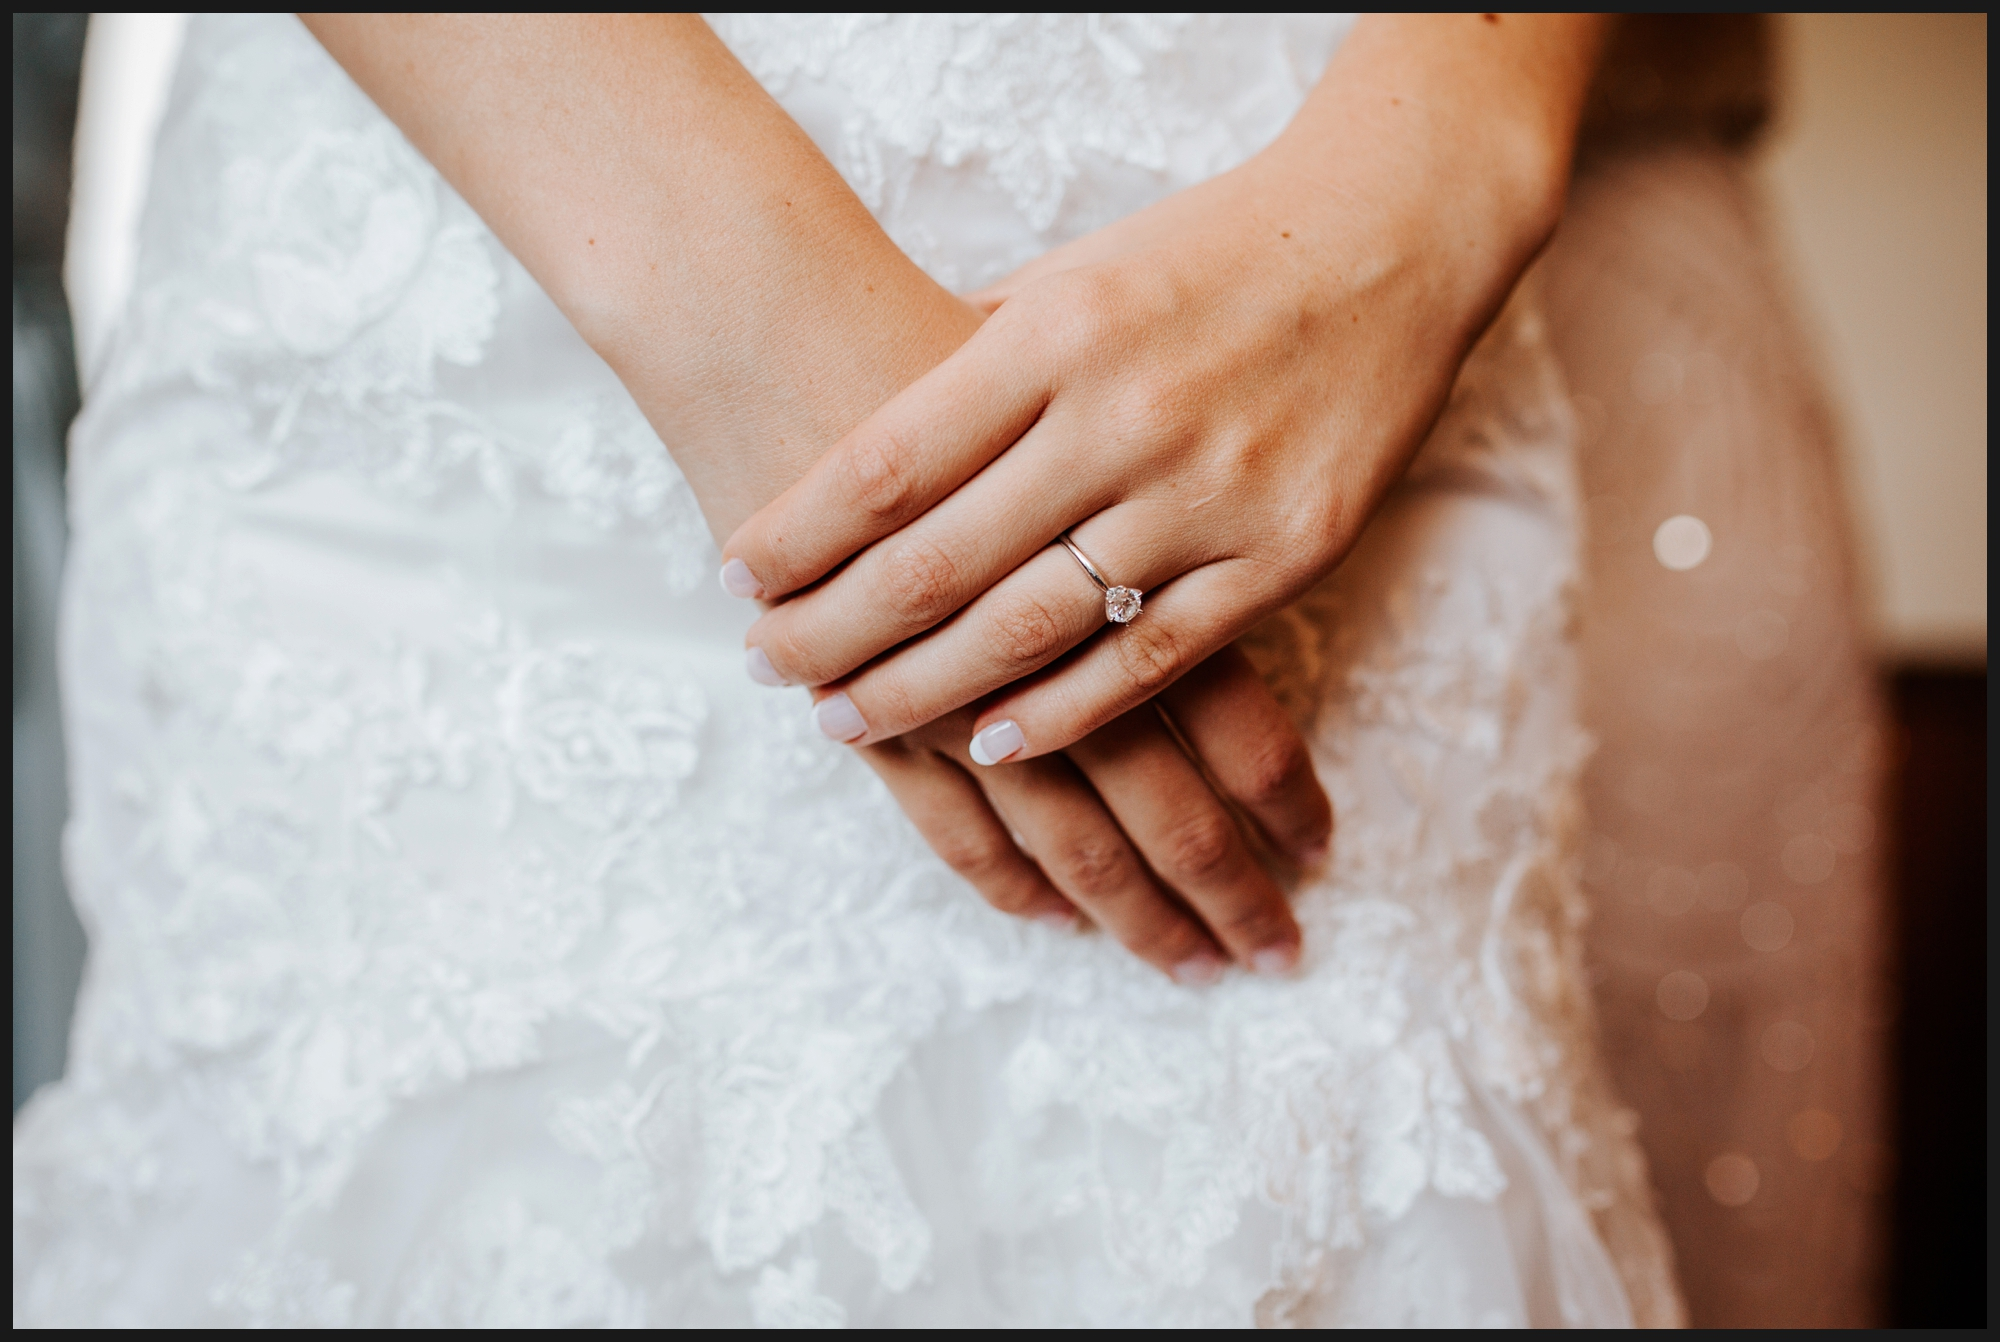 Orlando-Wedding-Photographer-destination-wedding-photographer-florida-wedding-photographer-bohemian-wedding-photographer_0048.jpg